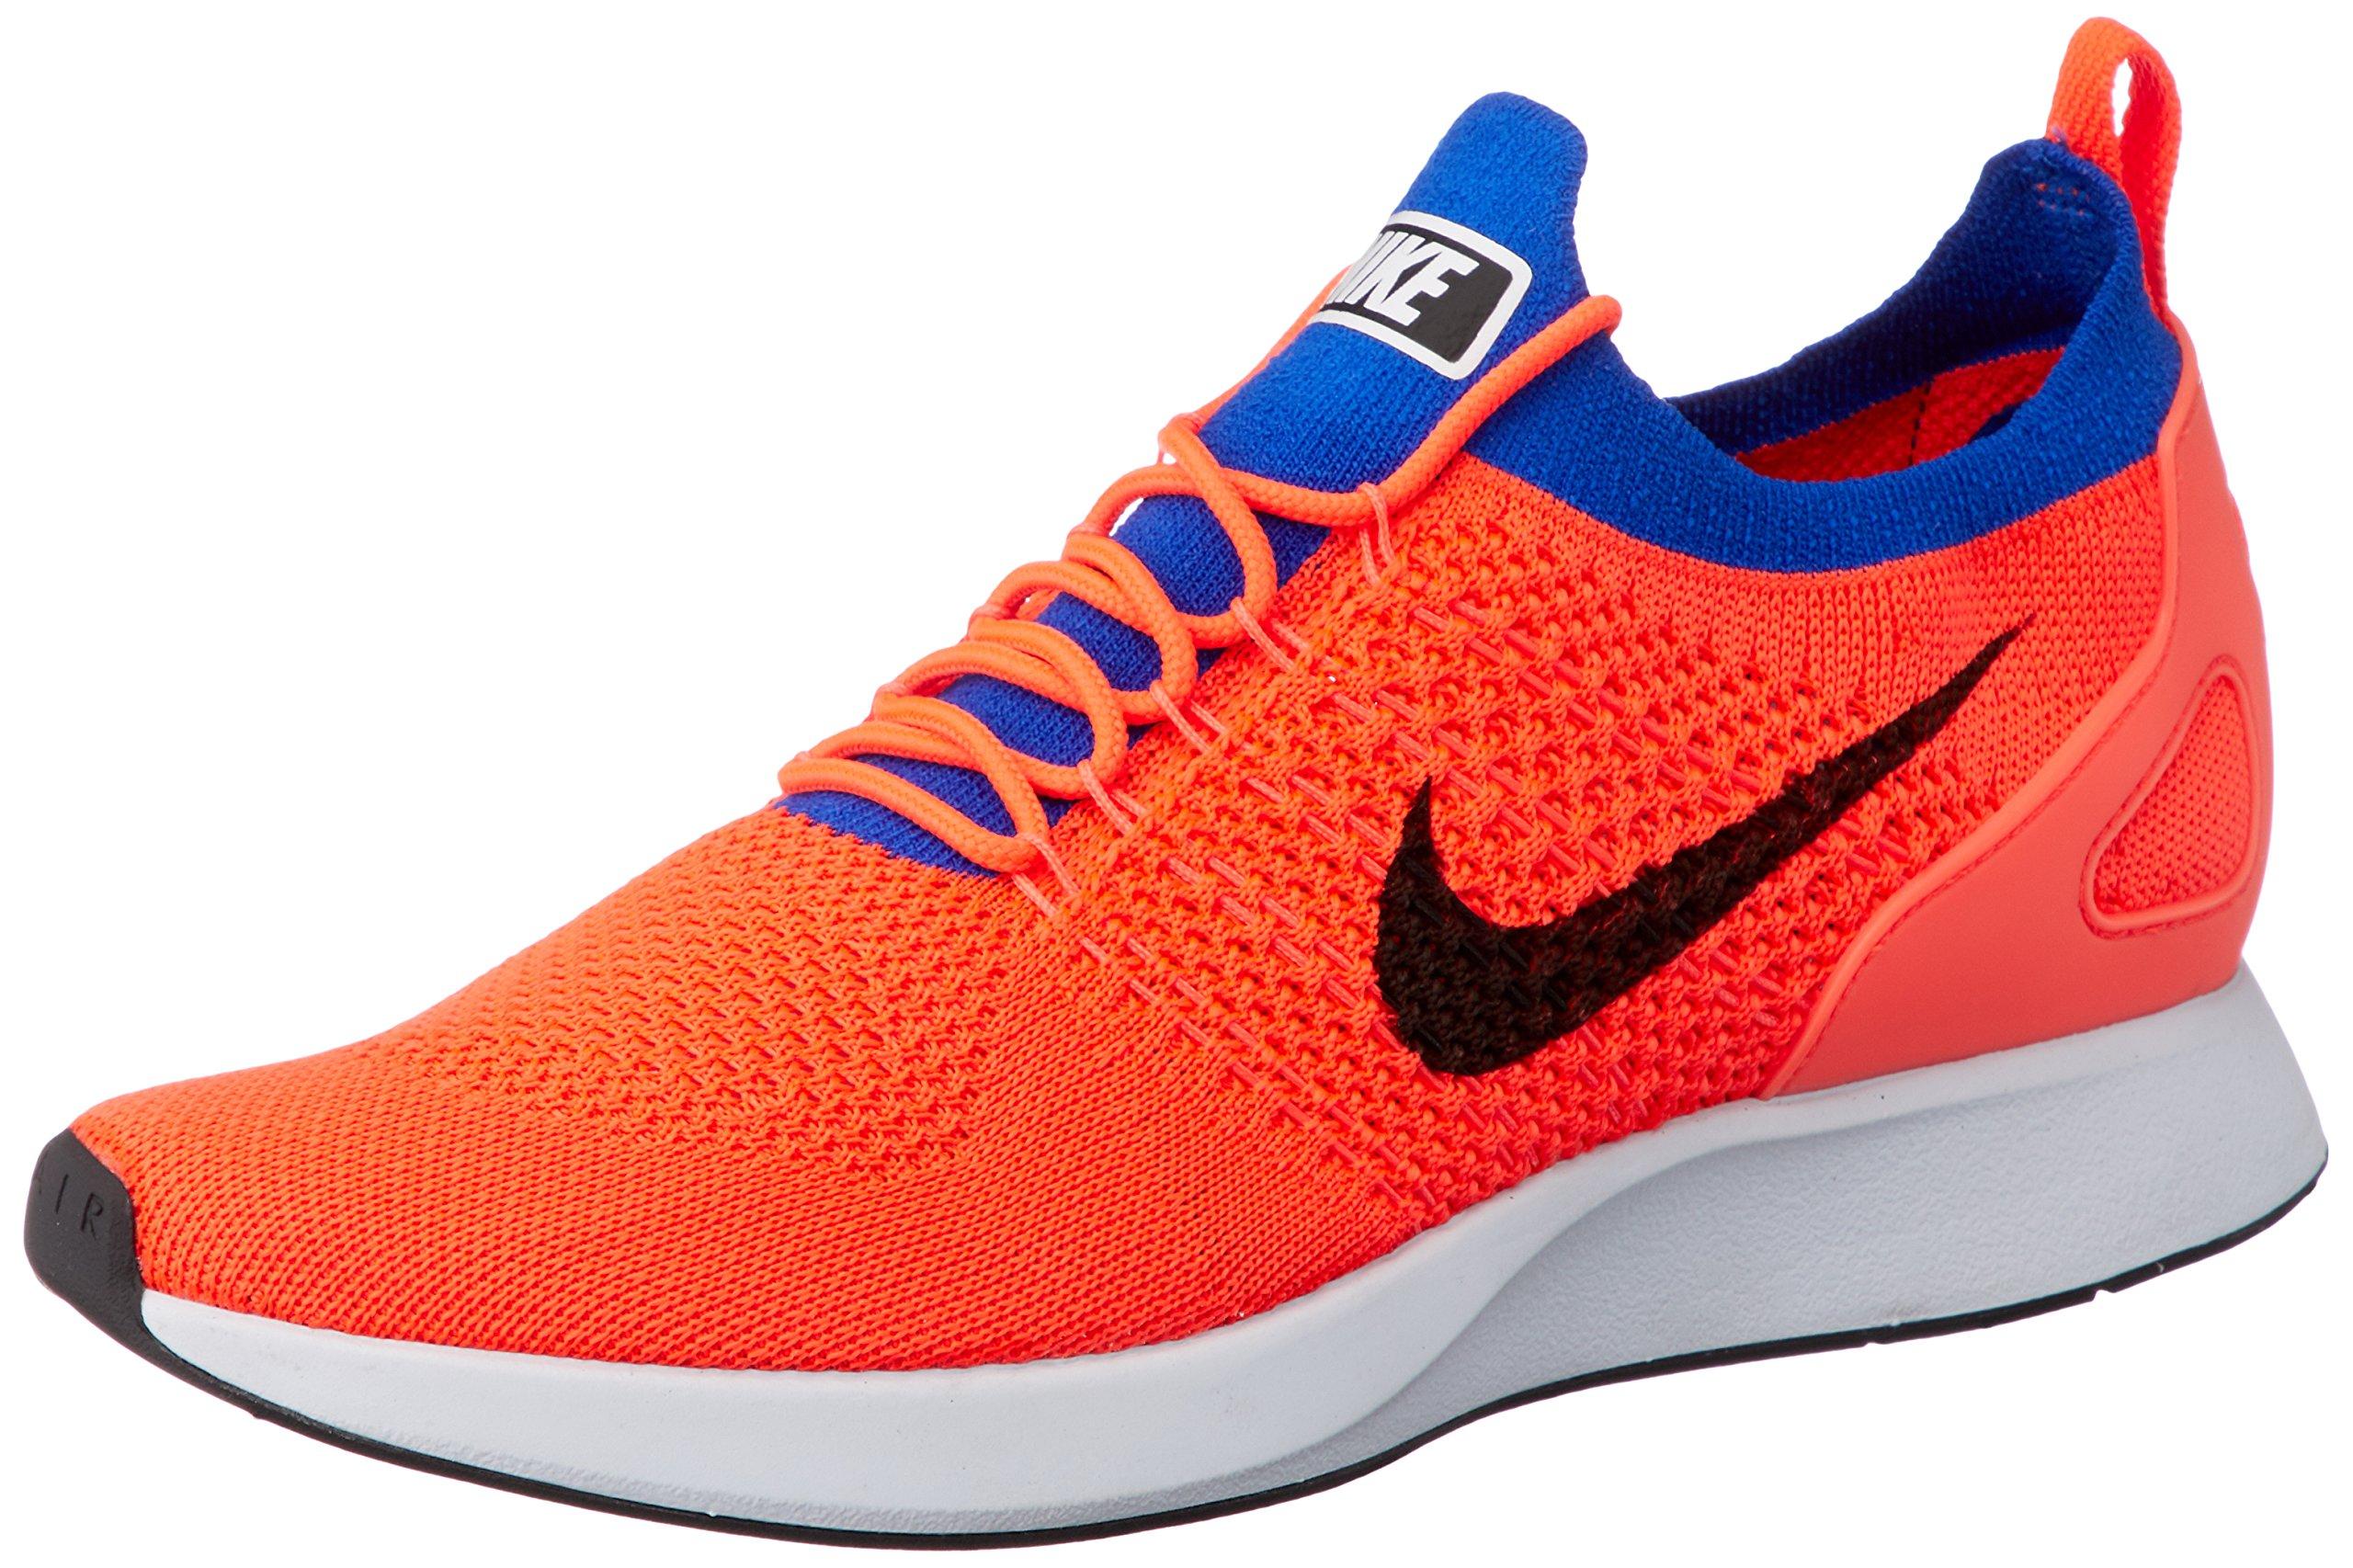 premium selection ef9d9 9b80e Galleon - Nike Mens Air Zoom Mariah Flyknit Racer Running Shoe (7.5)